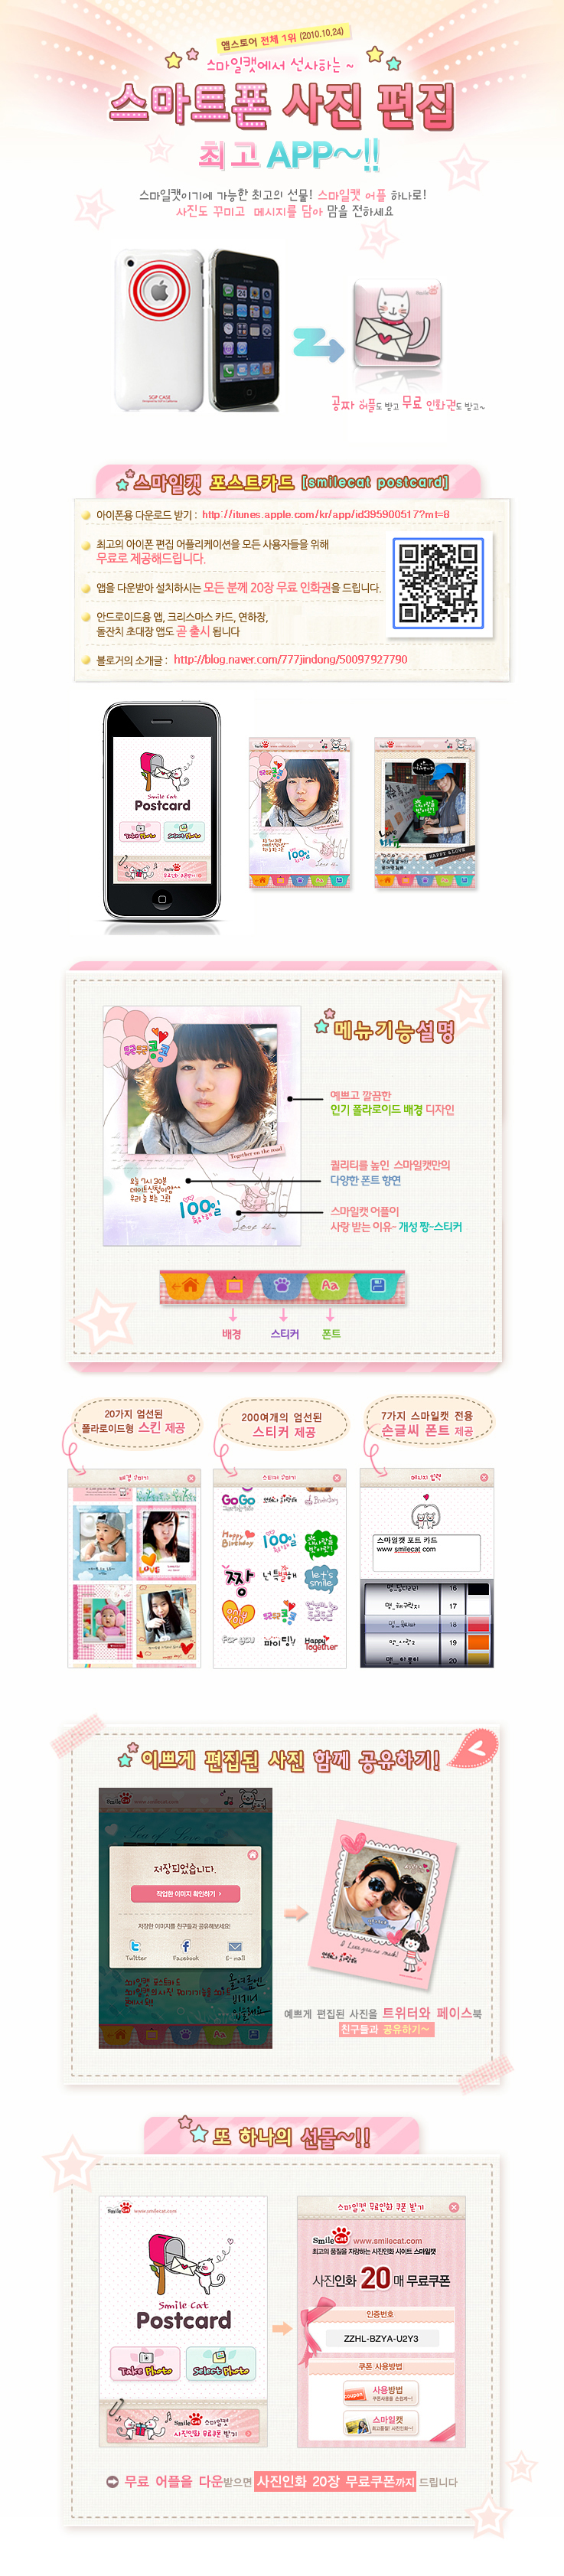 Cool Konayukiss Japanese Korean Cute Kawaii Apps For Iphone Ipod Ipad Hairstyles For Men Maxibearus